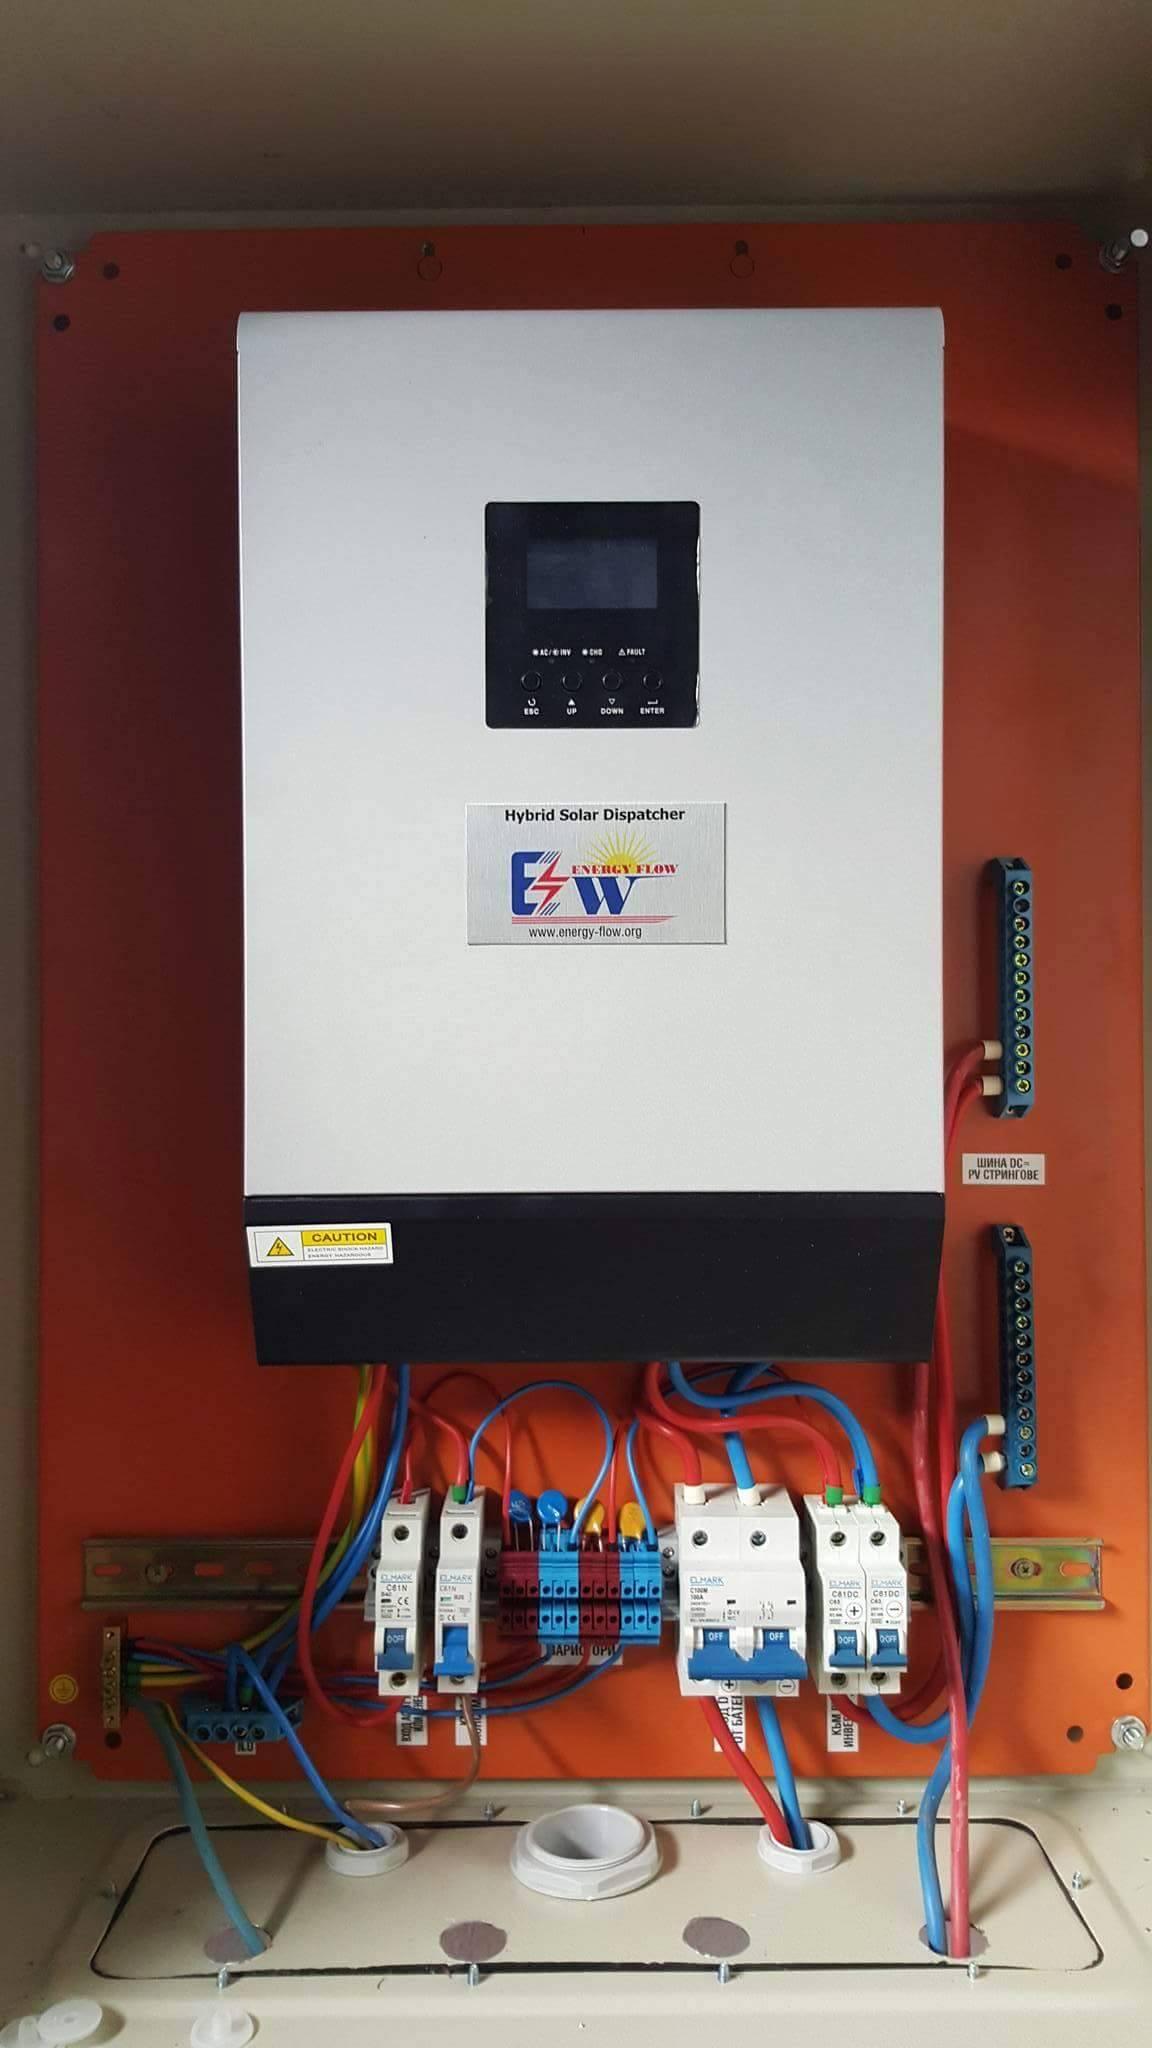 PV solar Dispatcher